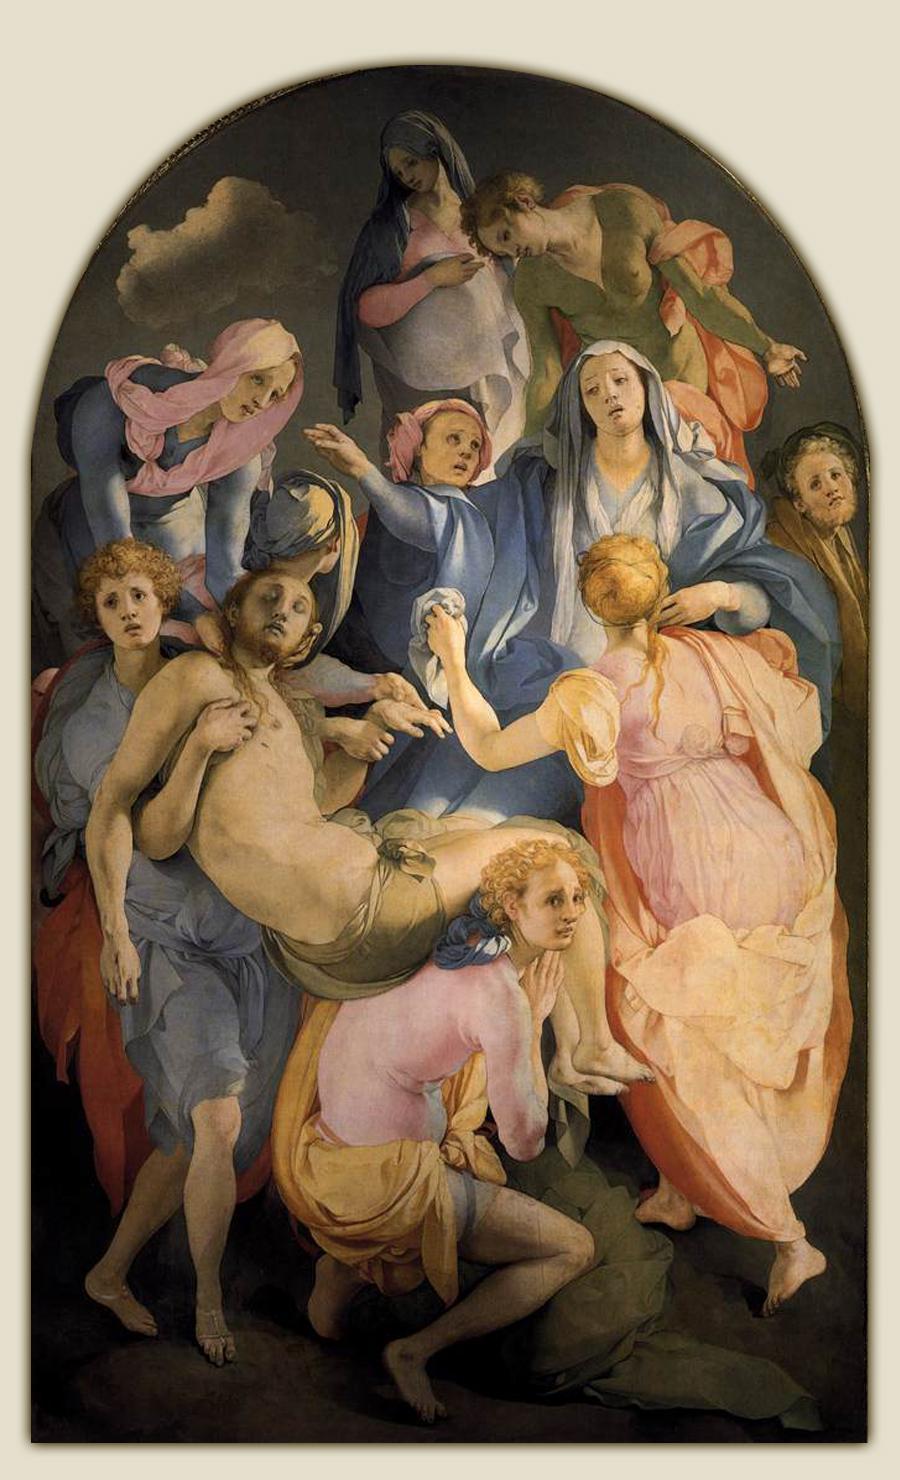 Jacopo Pontormo, Trasporto di Cristo, Firenze, Santa Felicita